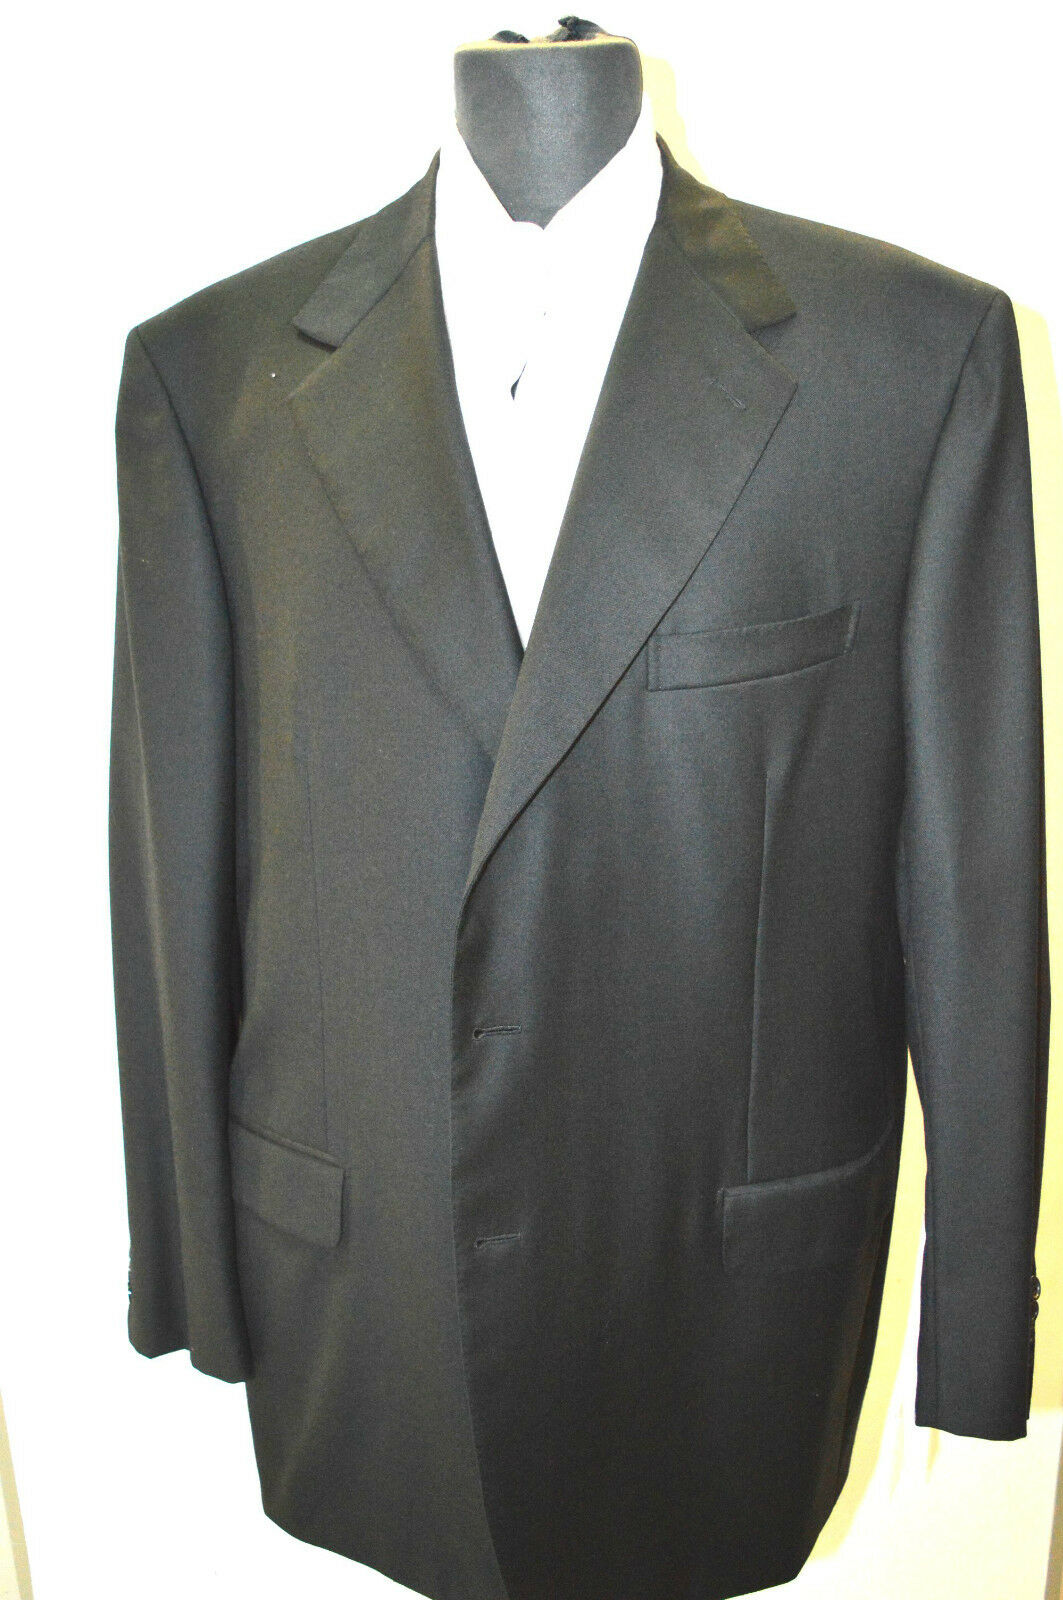 NEW BRIONI Nomentano  Suit  100% Wool  48 Us 58  Eu (BRO 43)